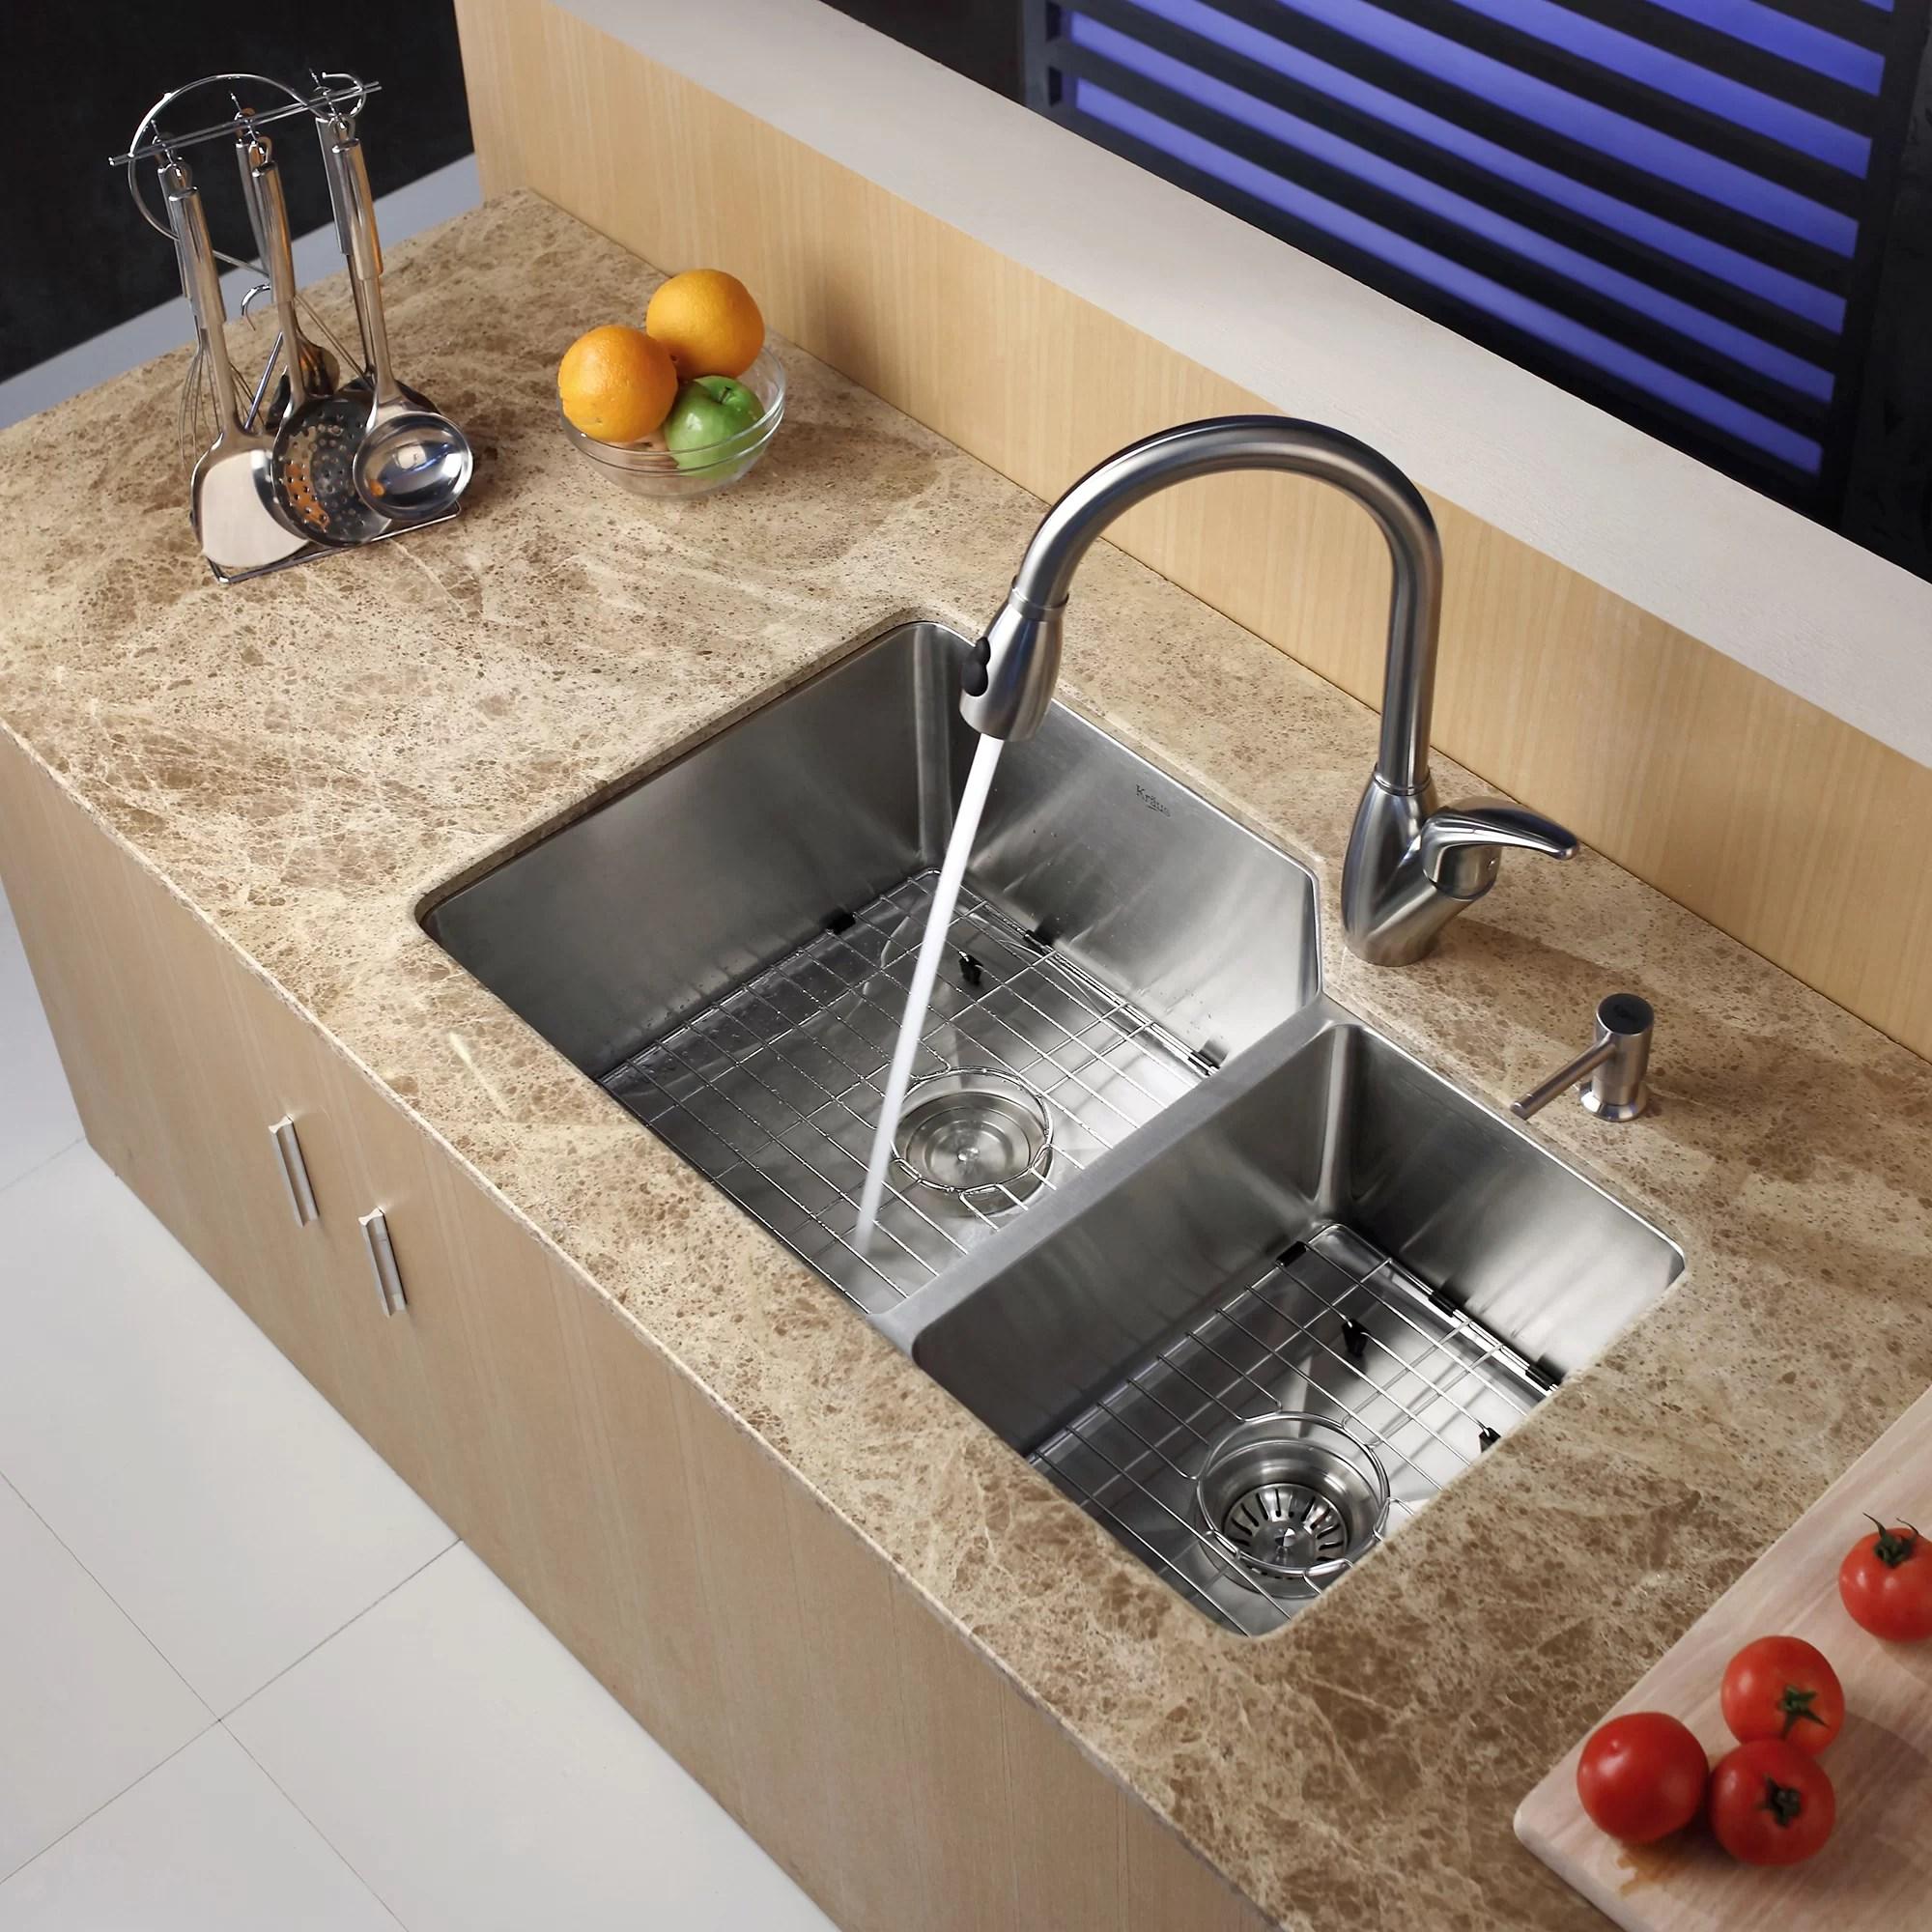 undermount double kitchen sink outdoor vent hood kraus 32 quot l x 20 w bowl 16 gauge